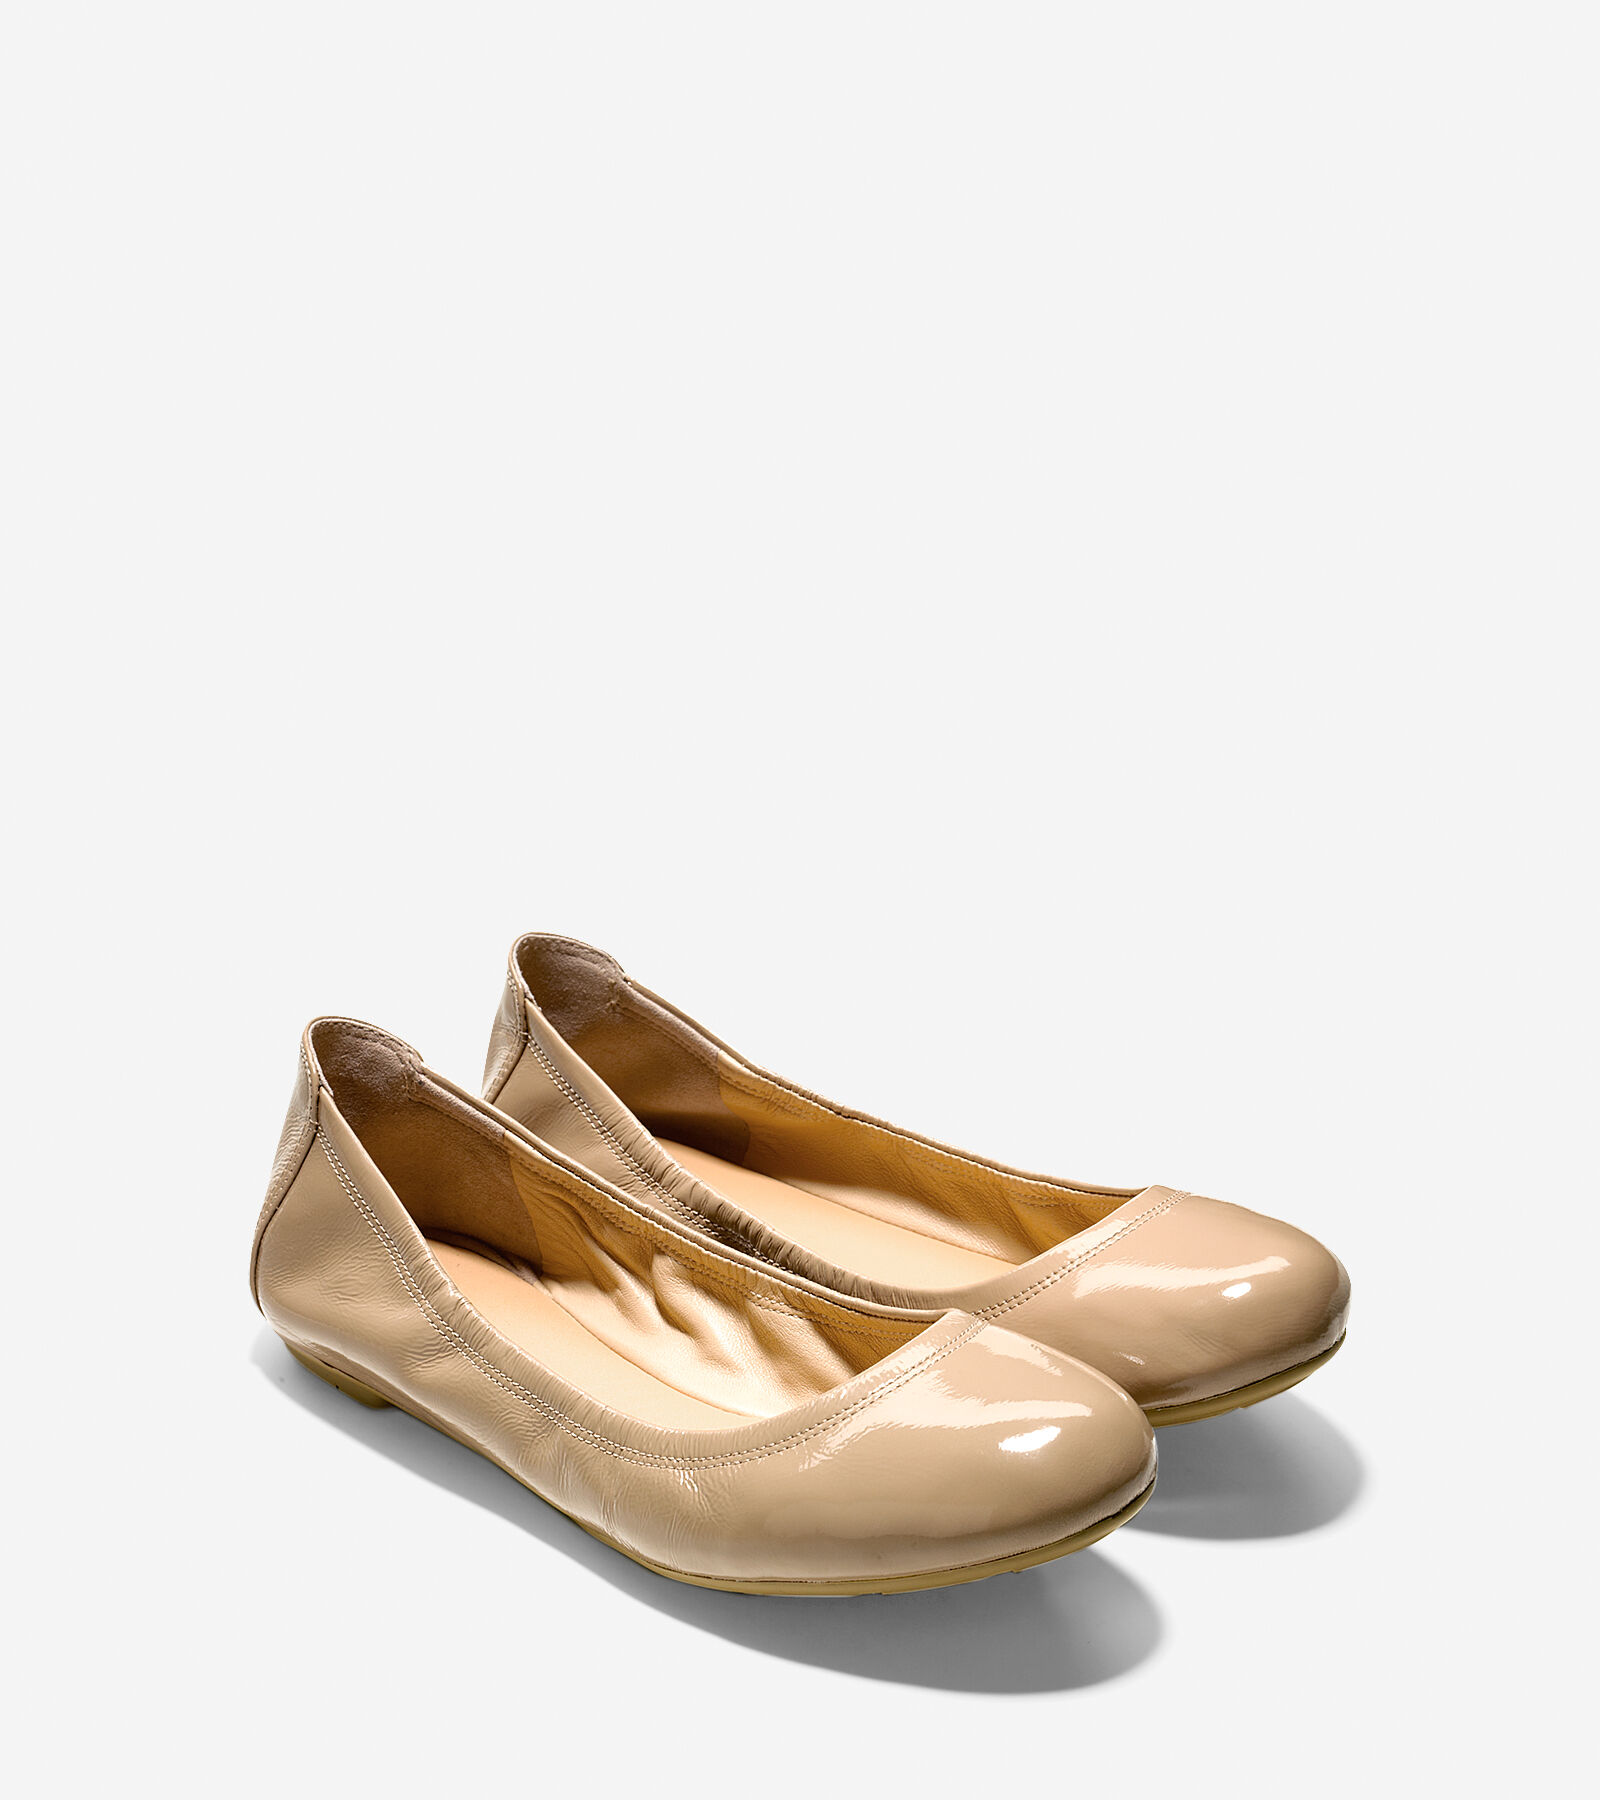 ... Manhattan Ballet Flat; Manhattan Ballet Flat. #colehaan